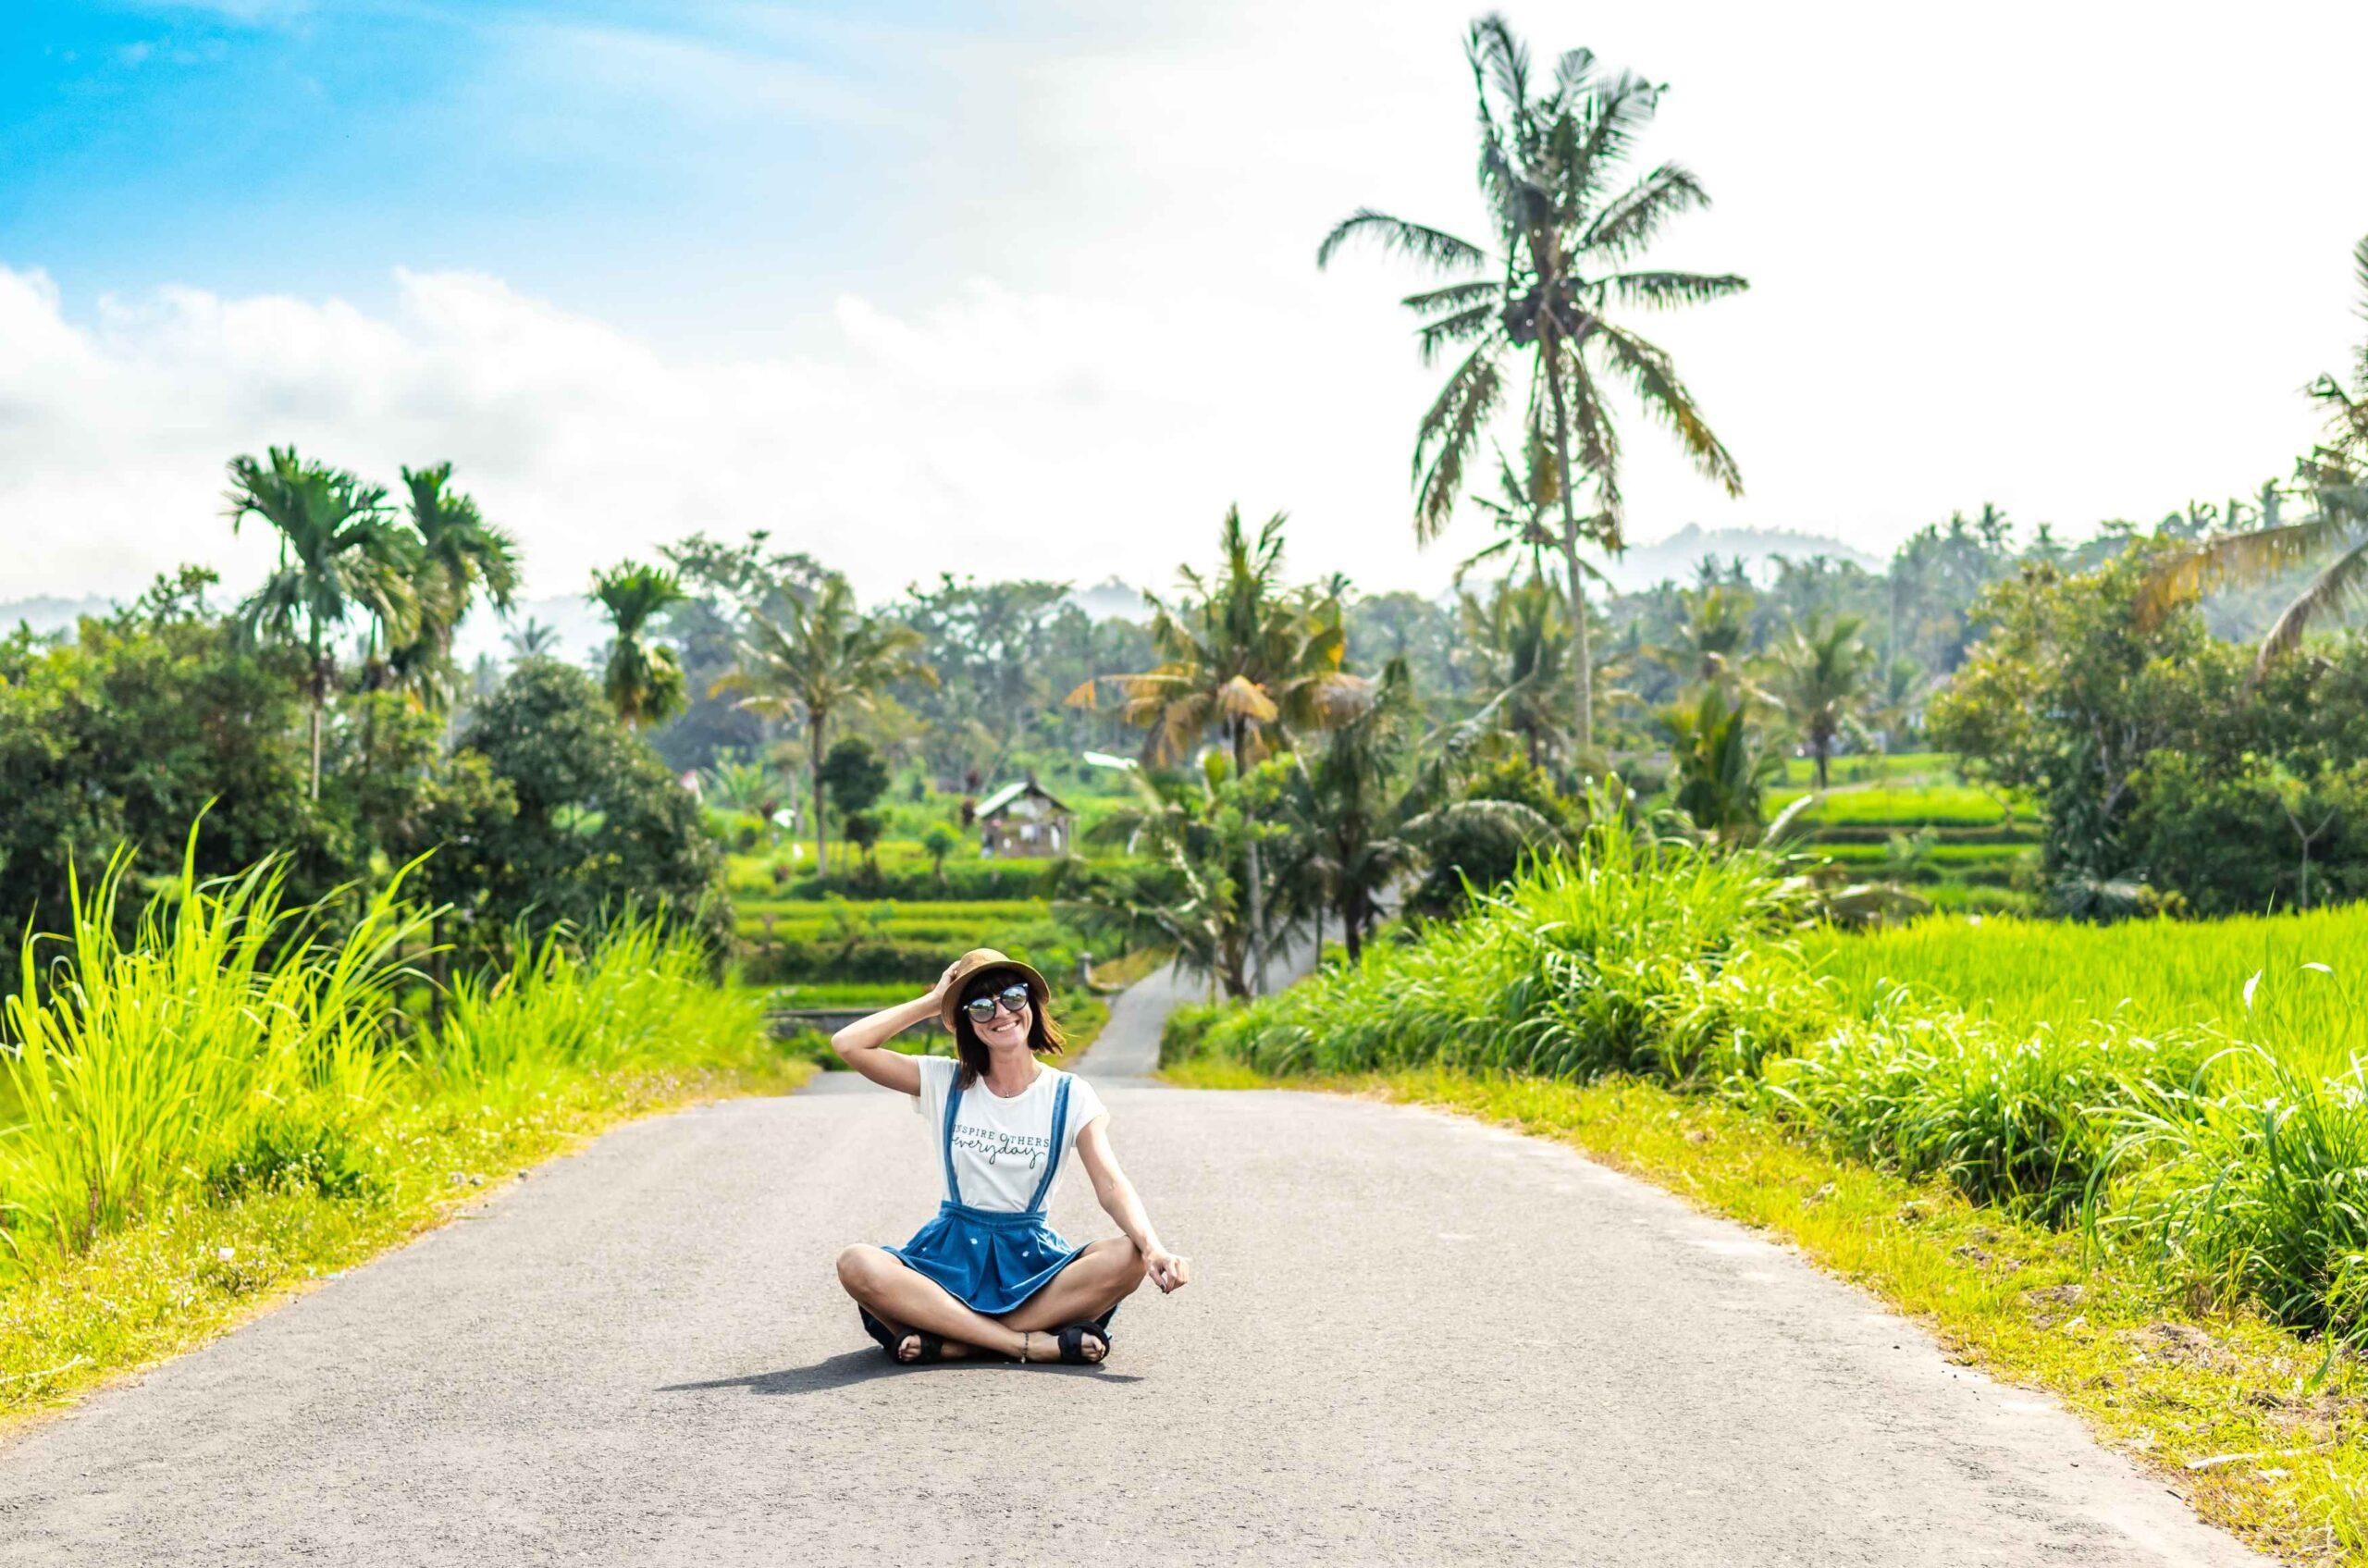 ubud, bali, travel, dekar's documents